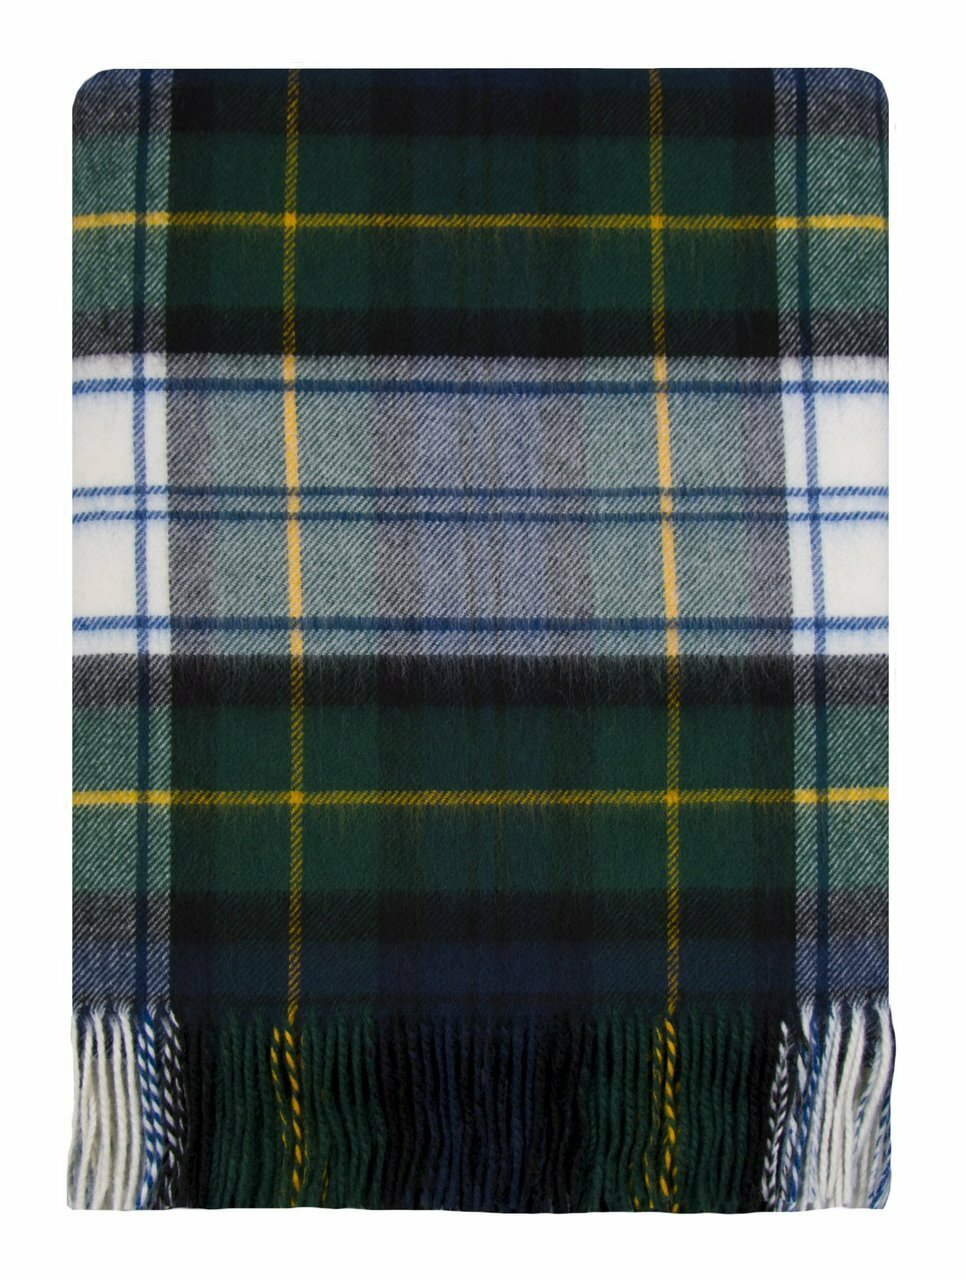 Gordon dress modern lambswool tartan or plaid blanket